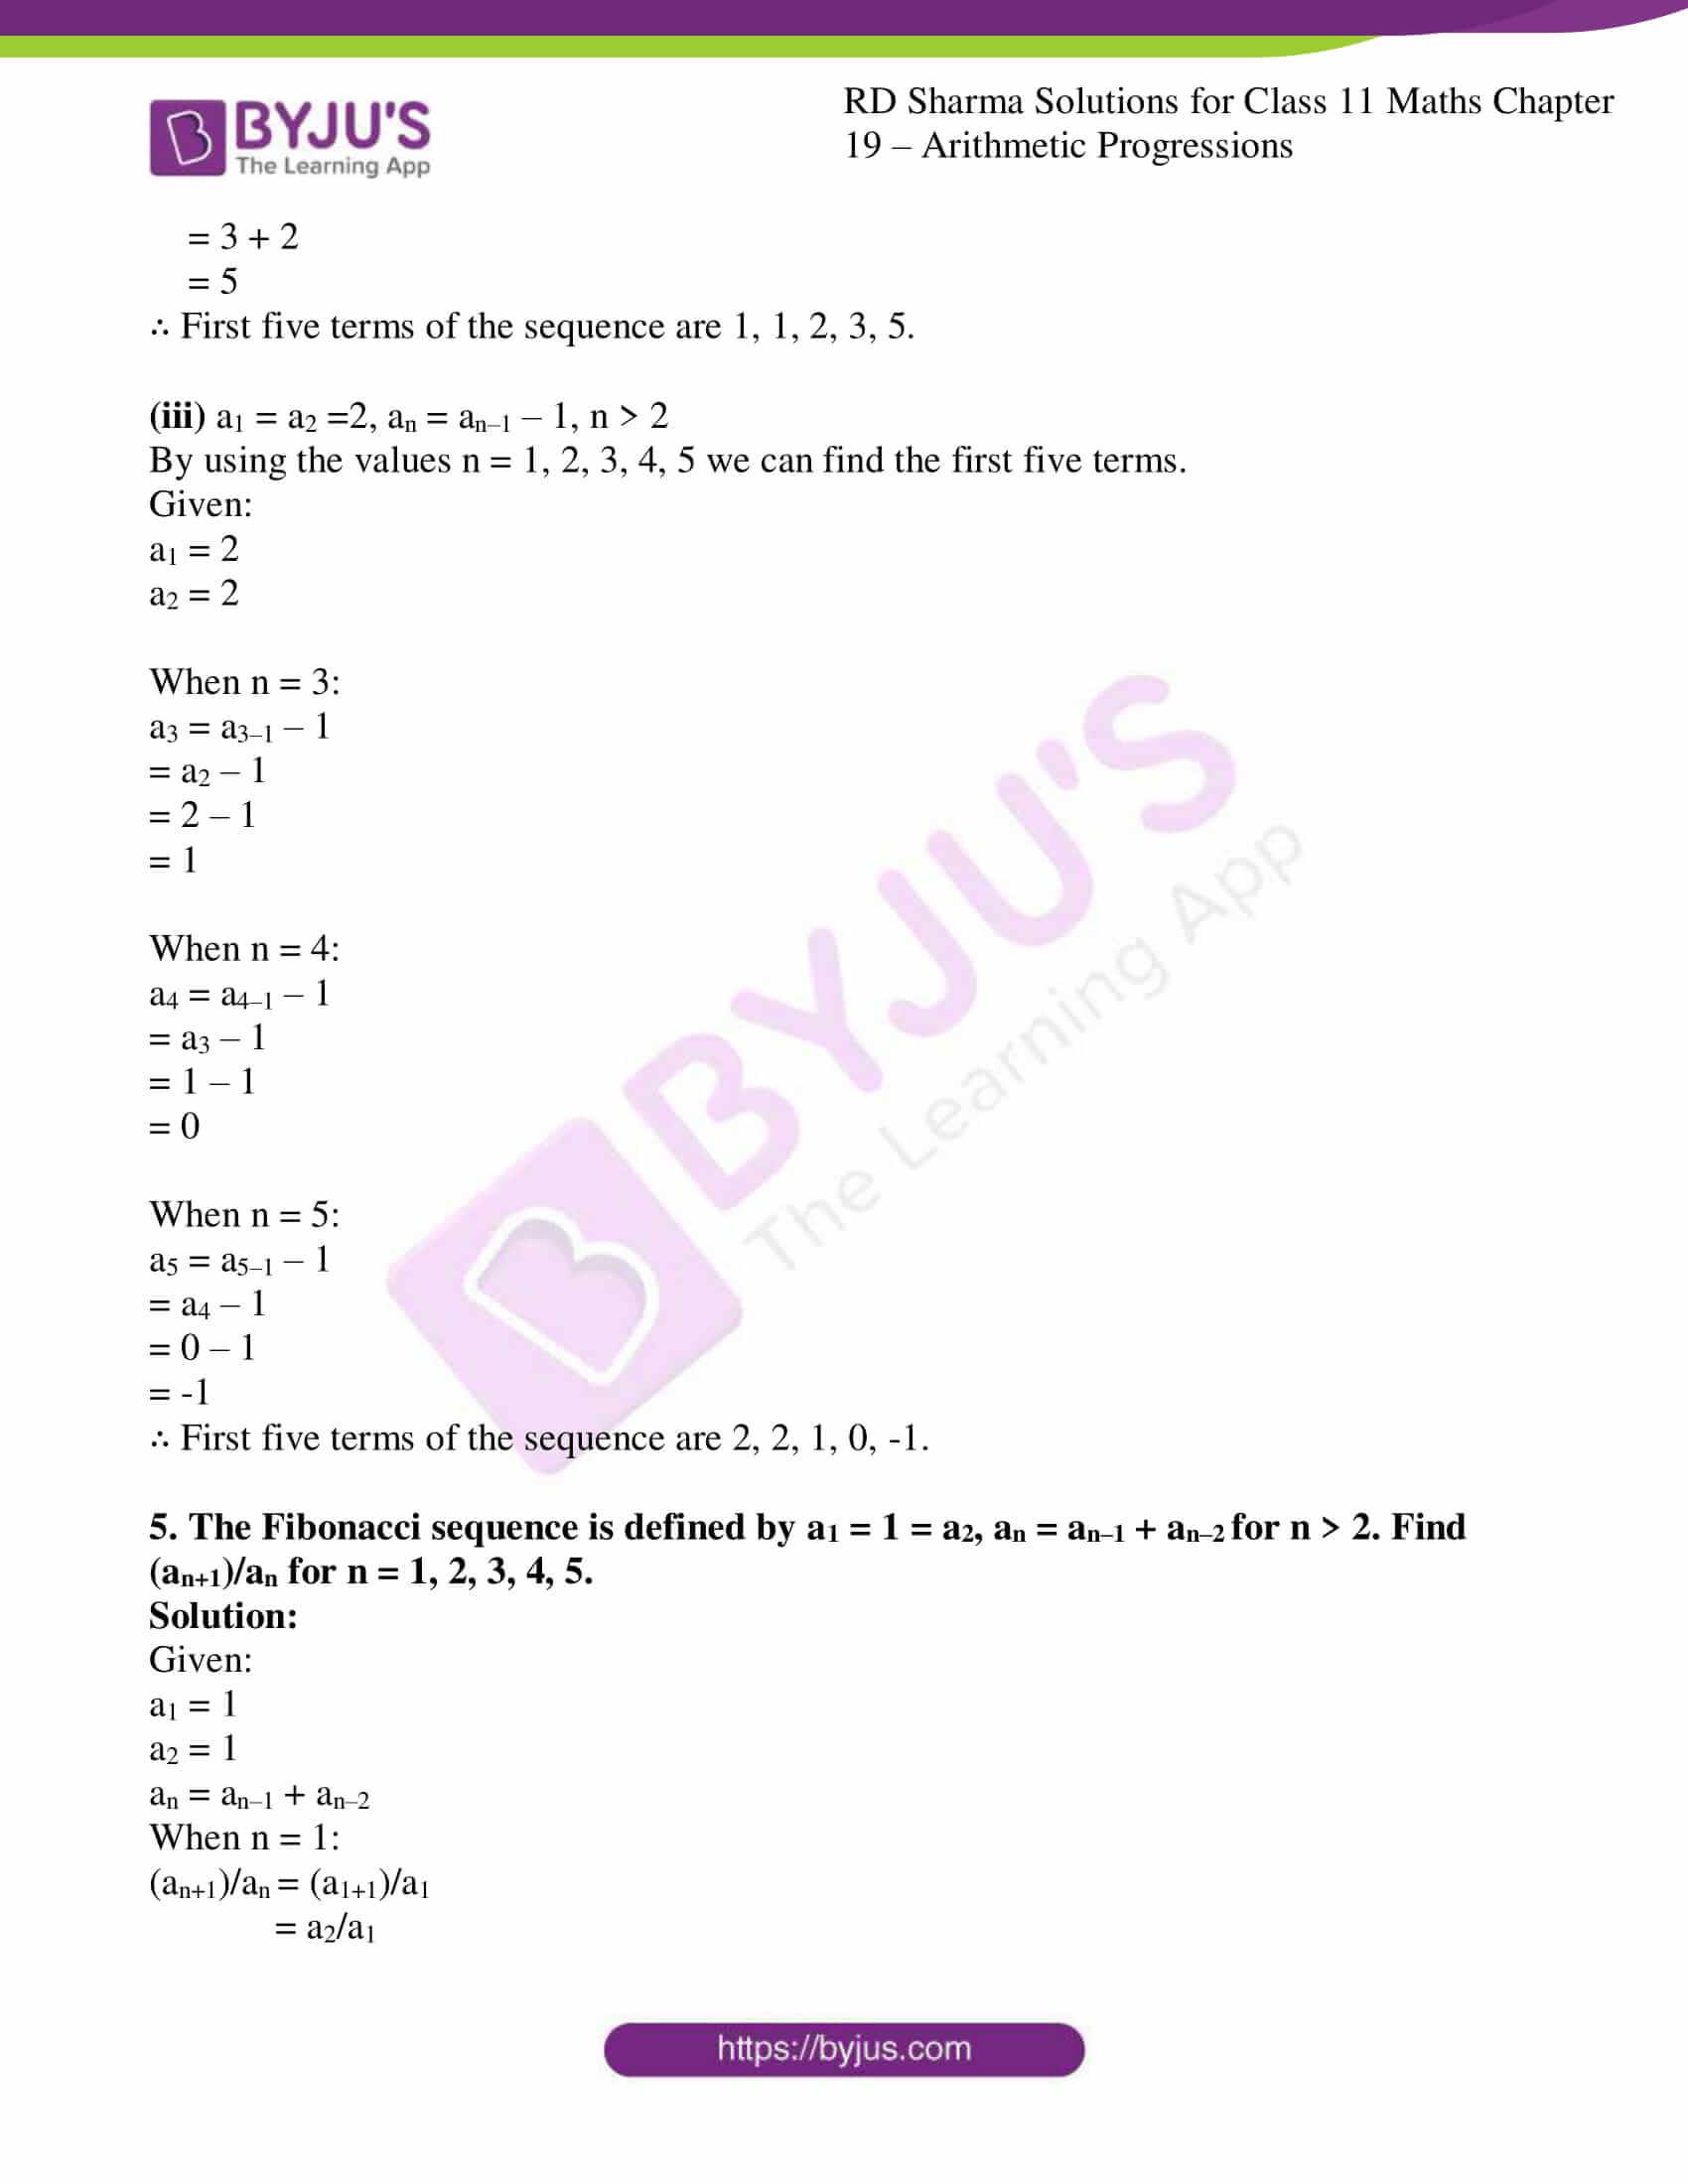 rd sharma class 11 maths ch 19 ex 1 5